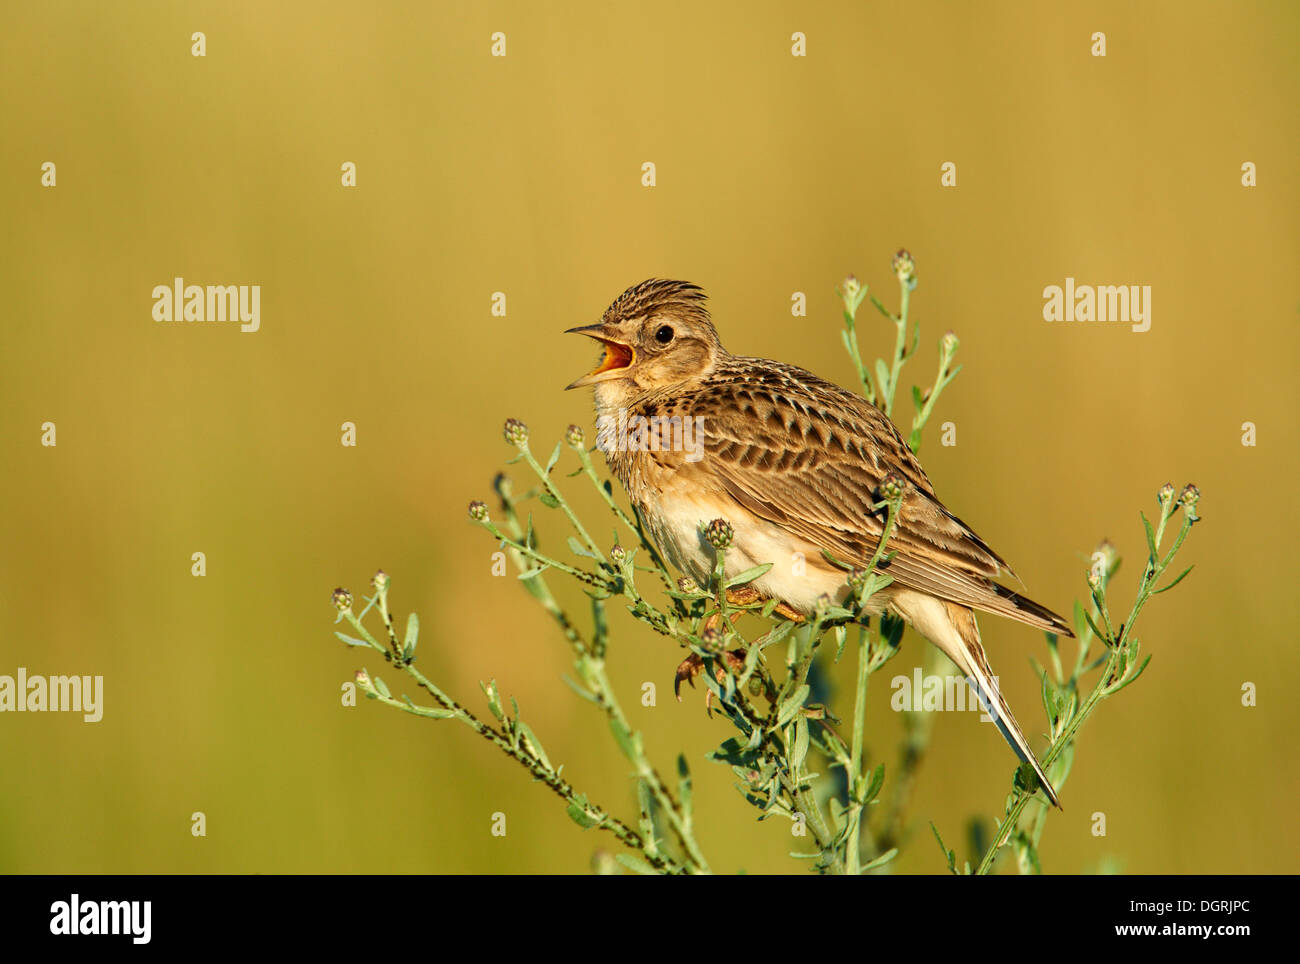 Skylark (Alauda arvensis), Apetlon, Burgenland, Austria, Europe - Stock Image